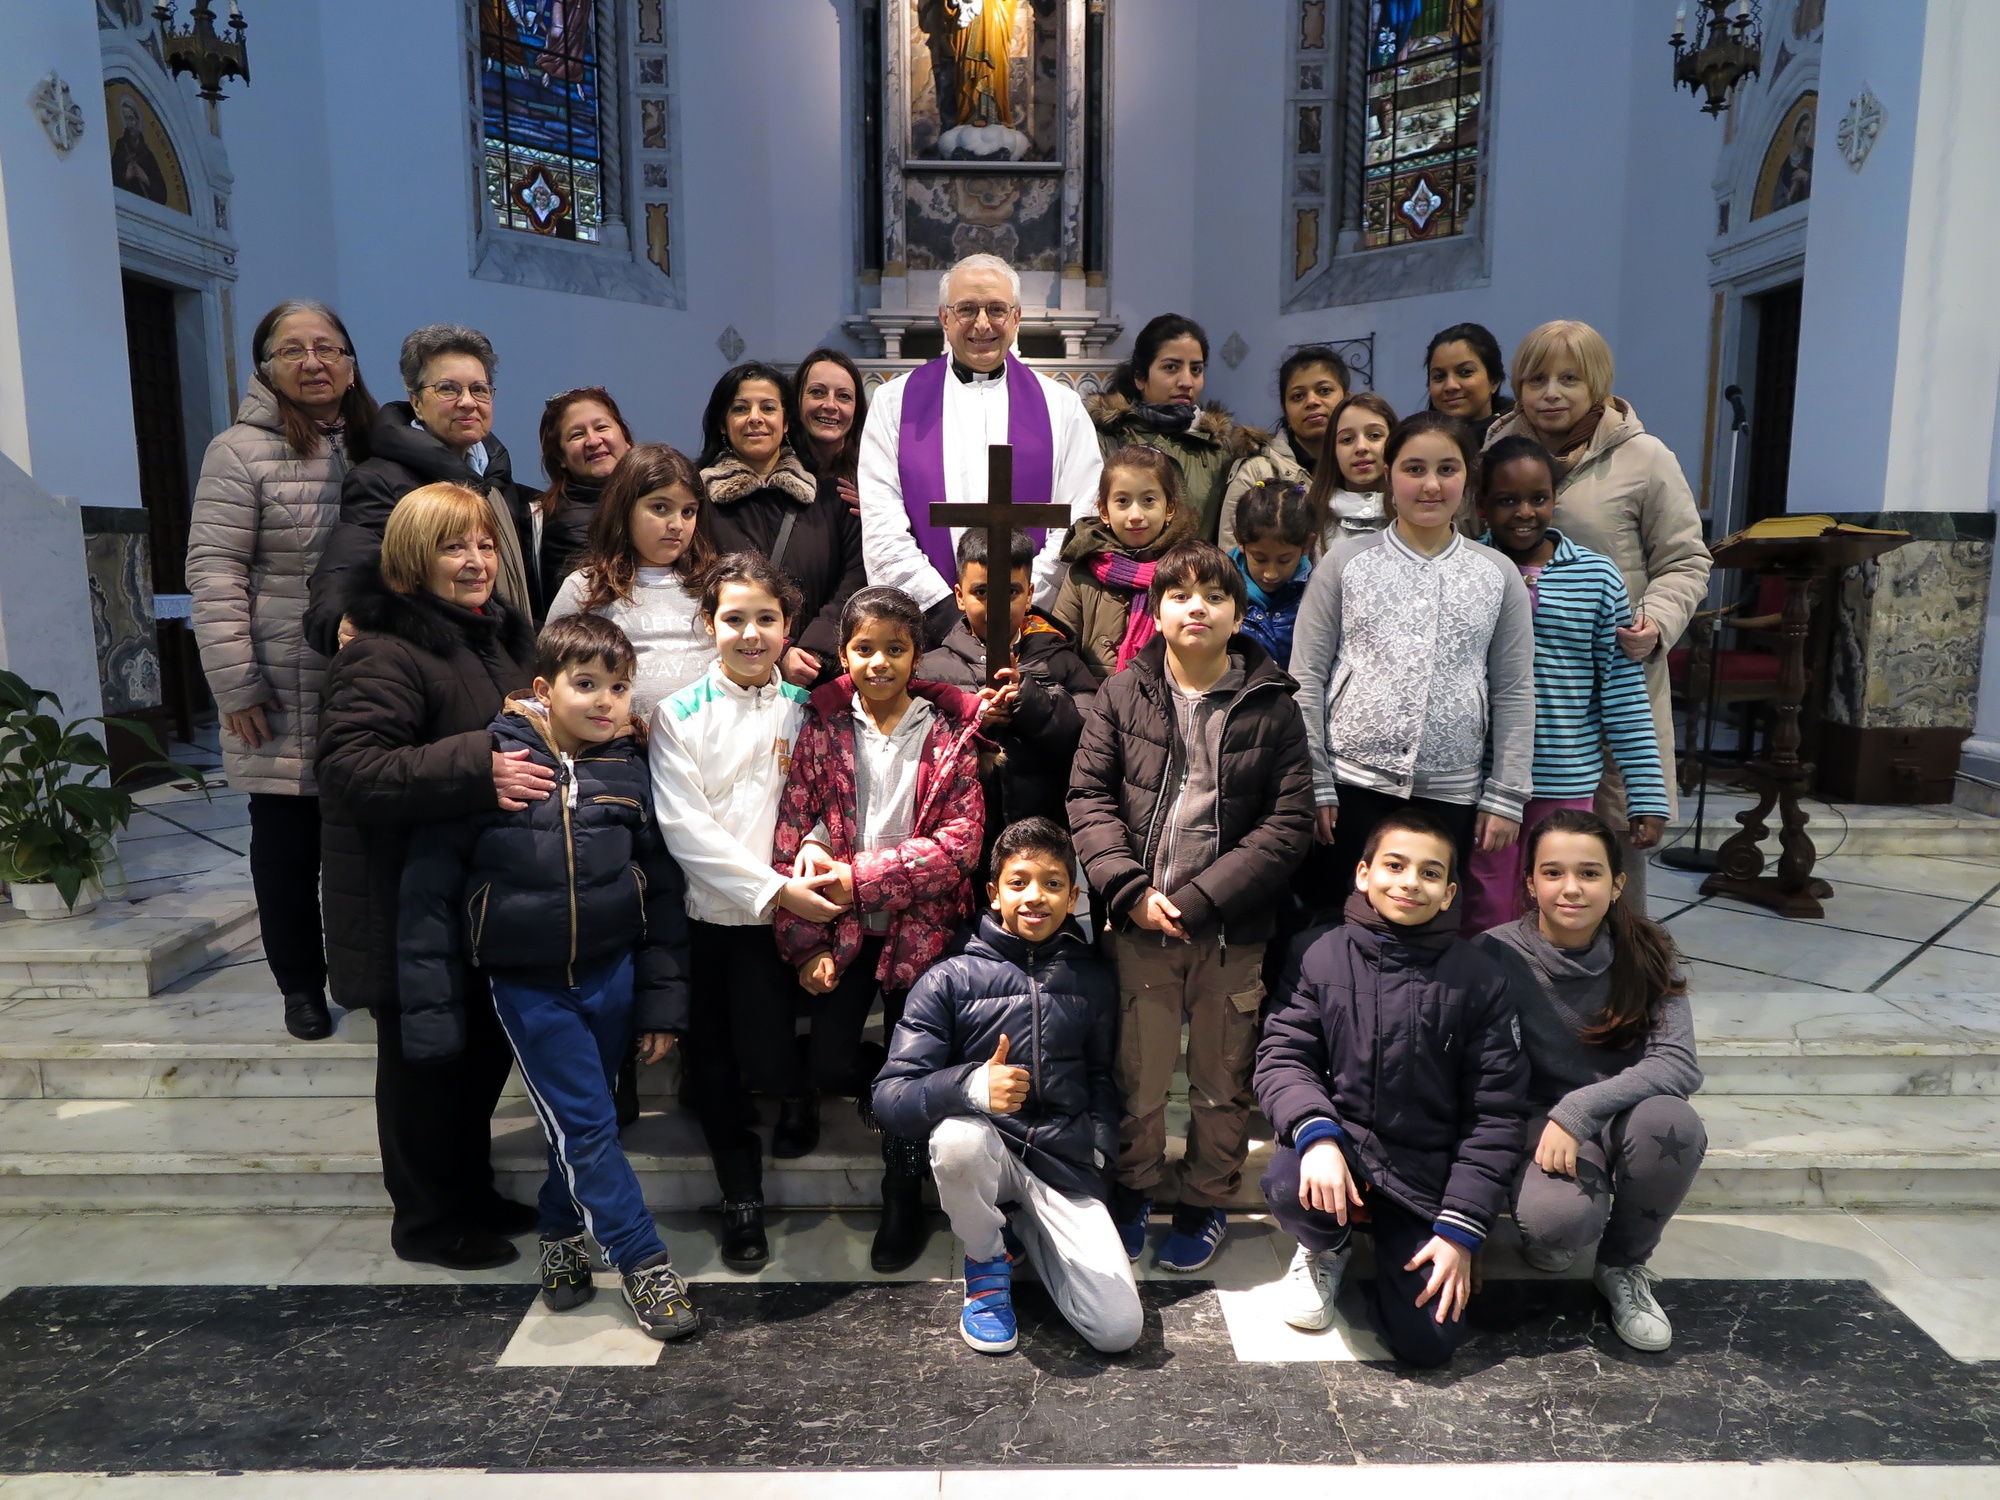 via-crucis-catechismo-2016-03-17-17-25-43